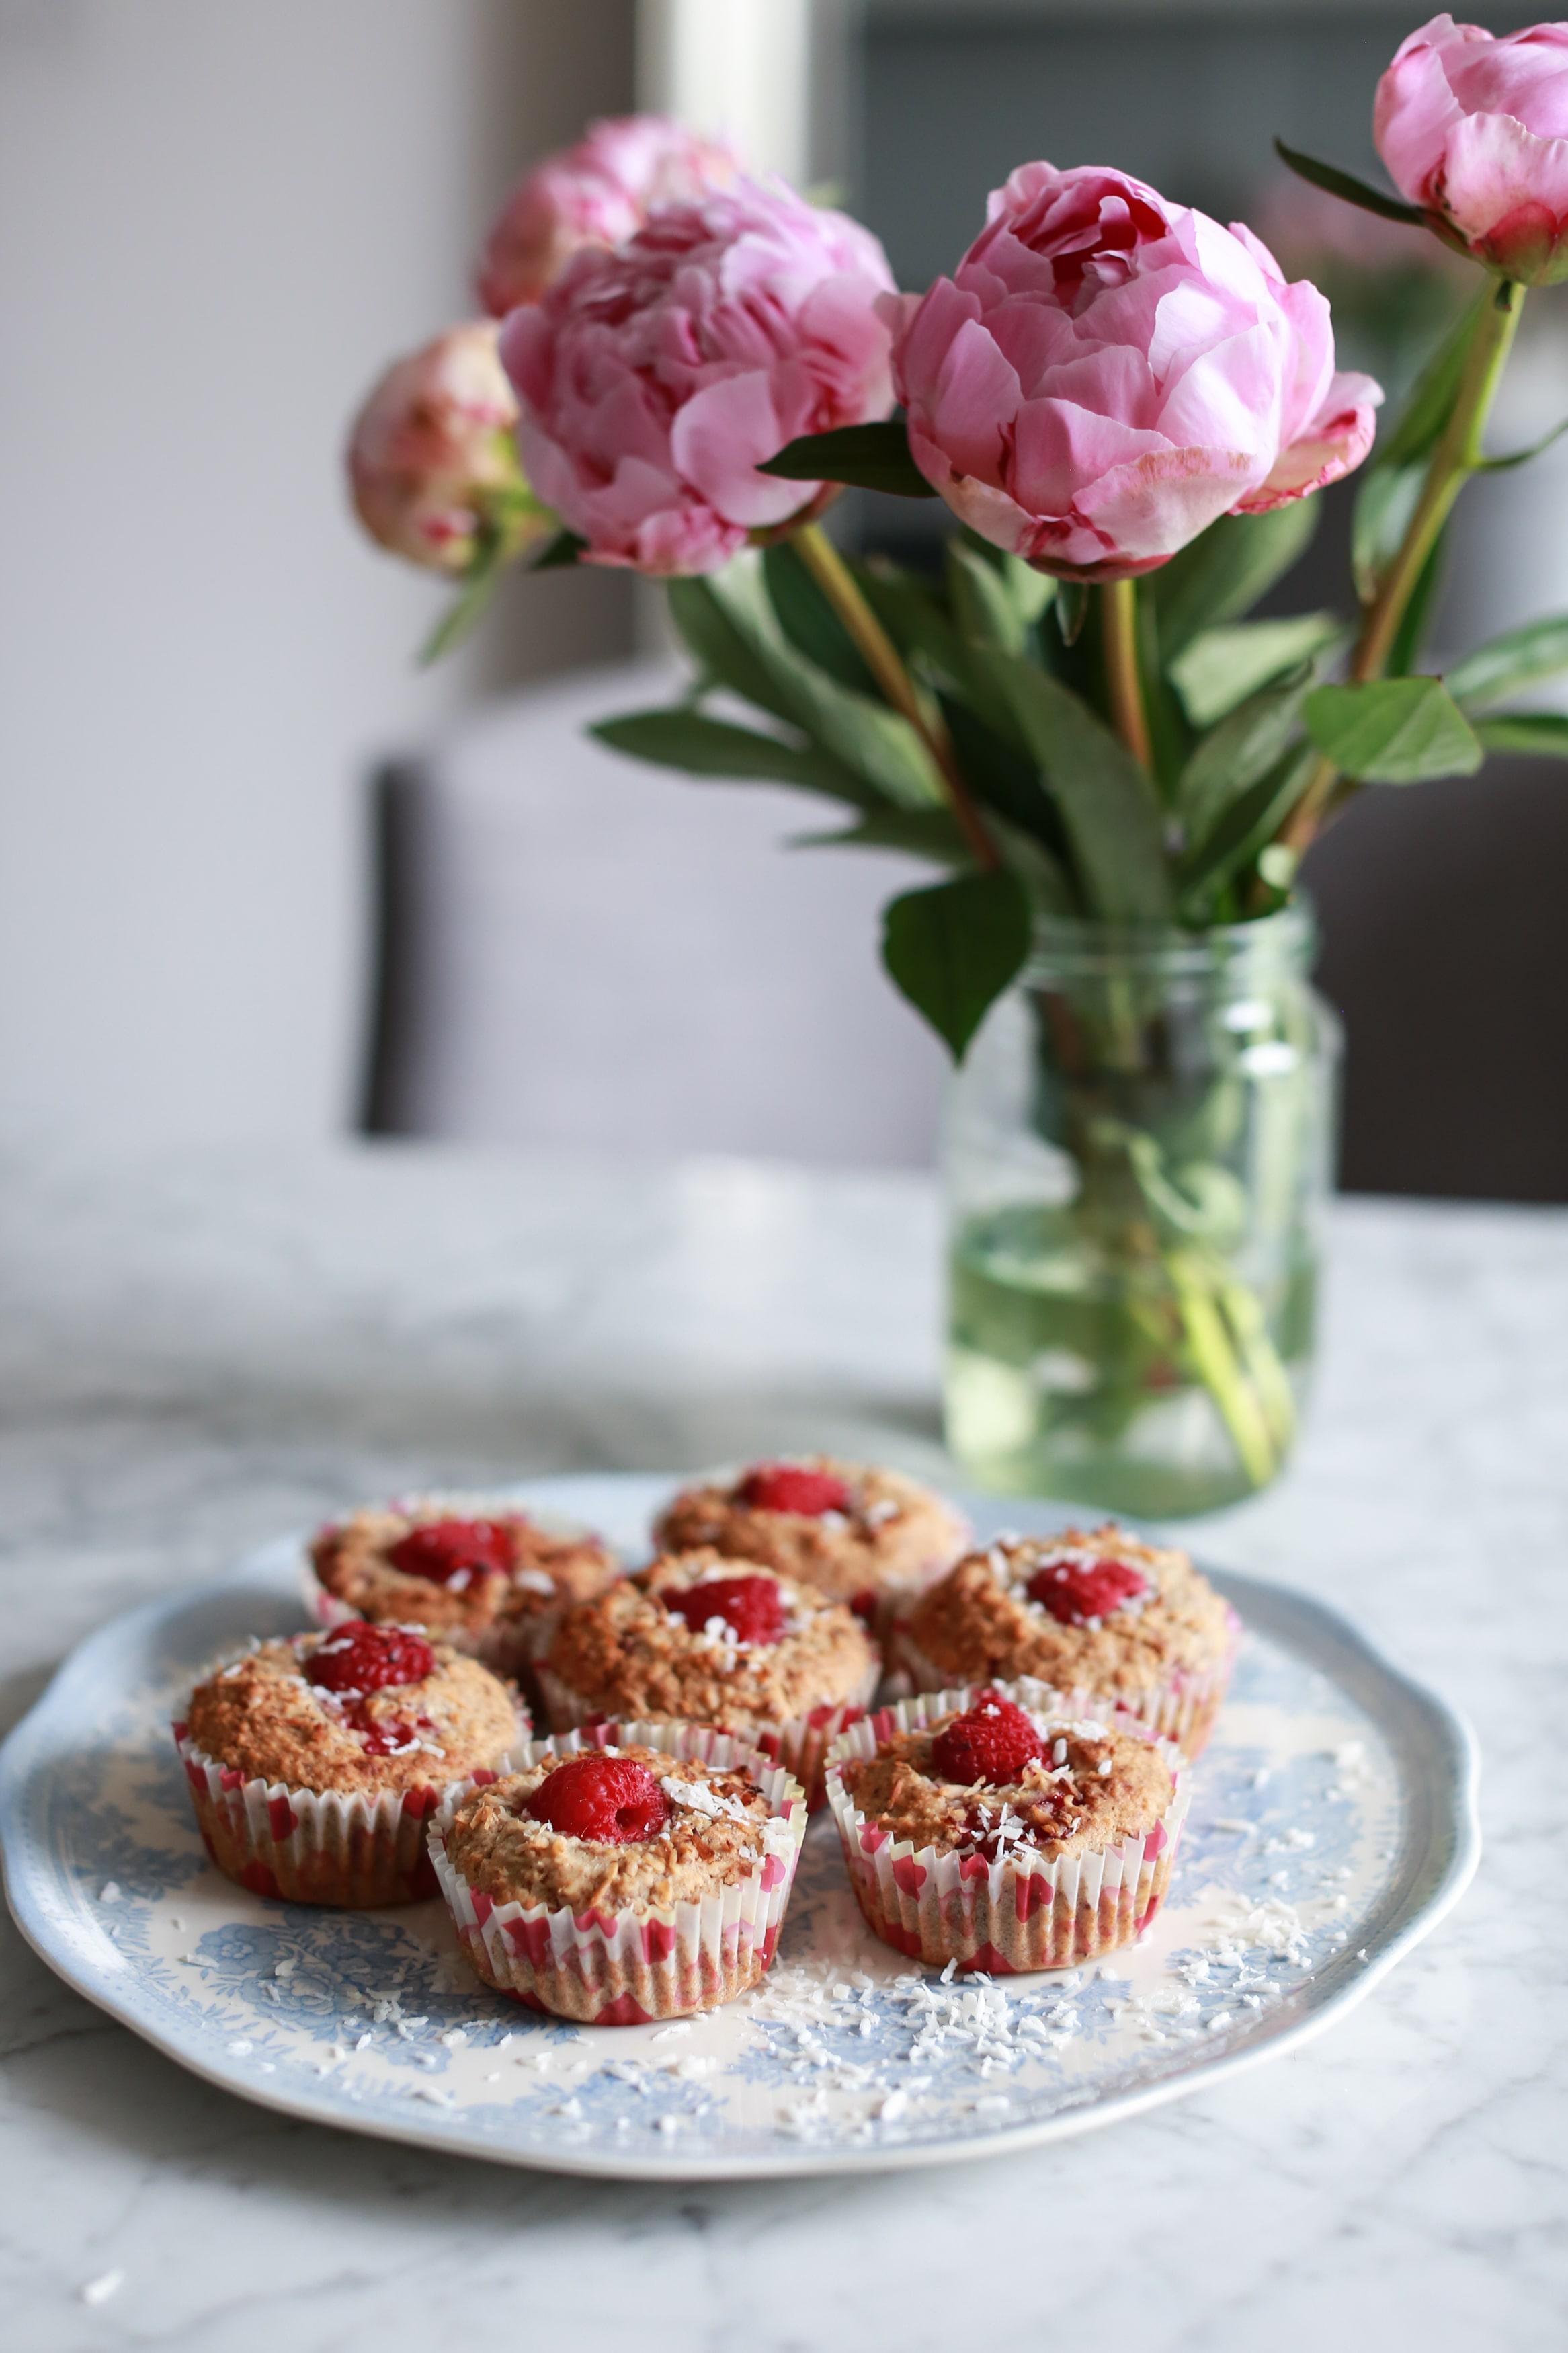 muffins-6-min